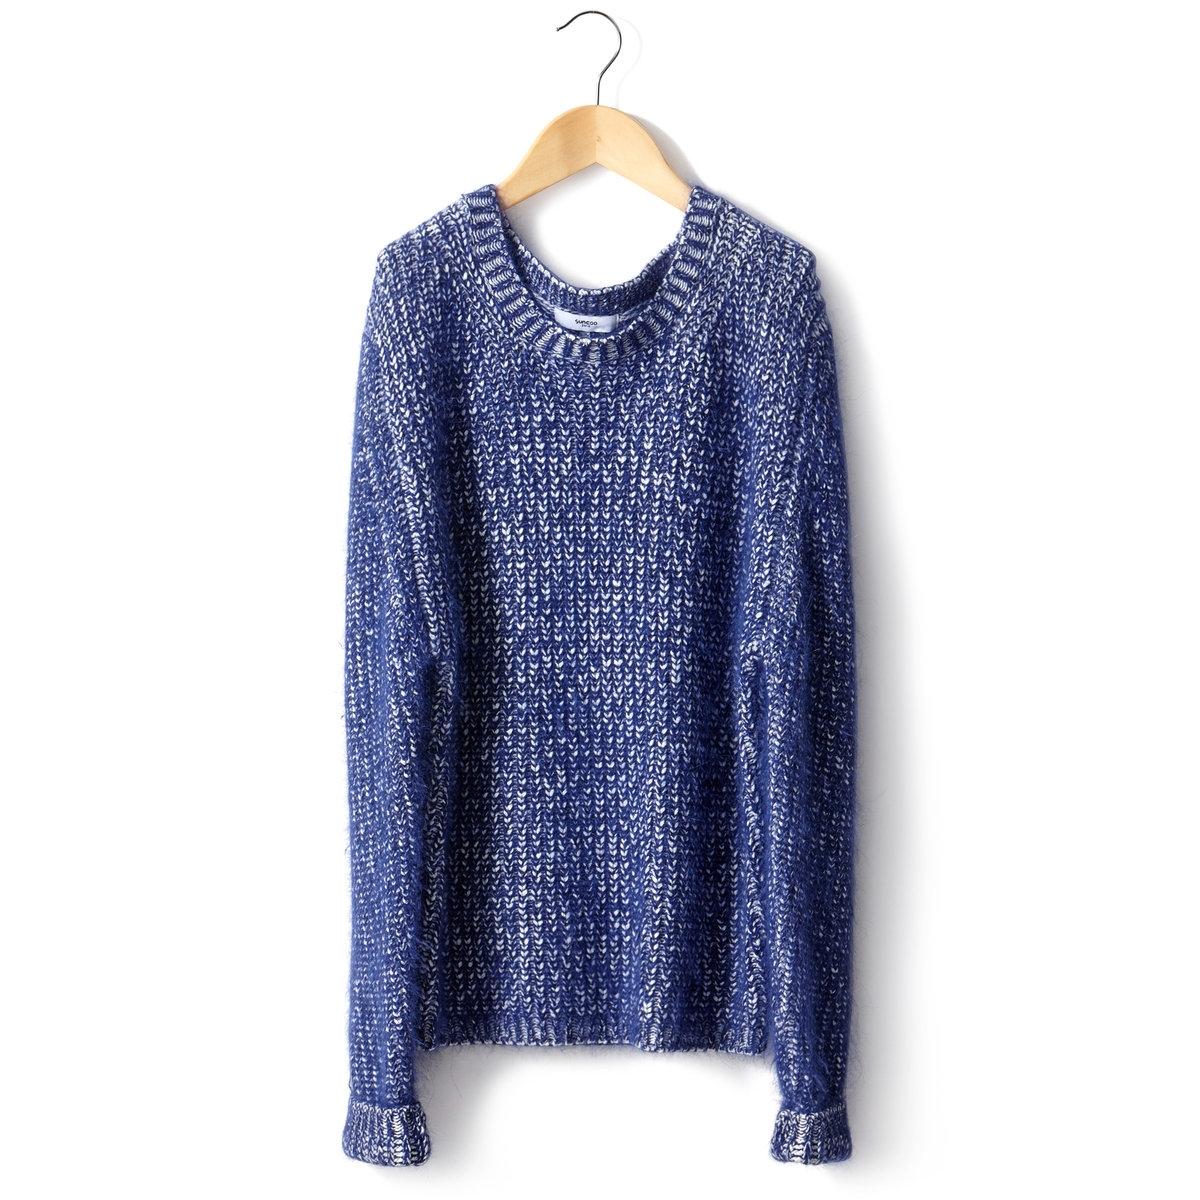 Пуловер<br><br>Цвет: синий<br>Размер: 1(S)